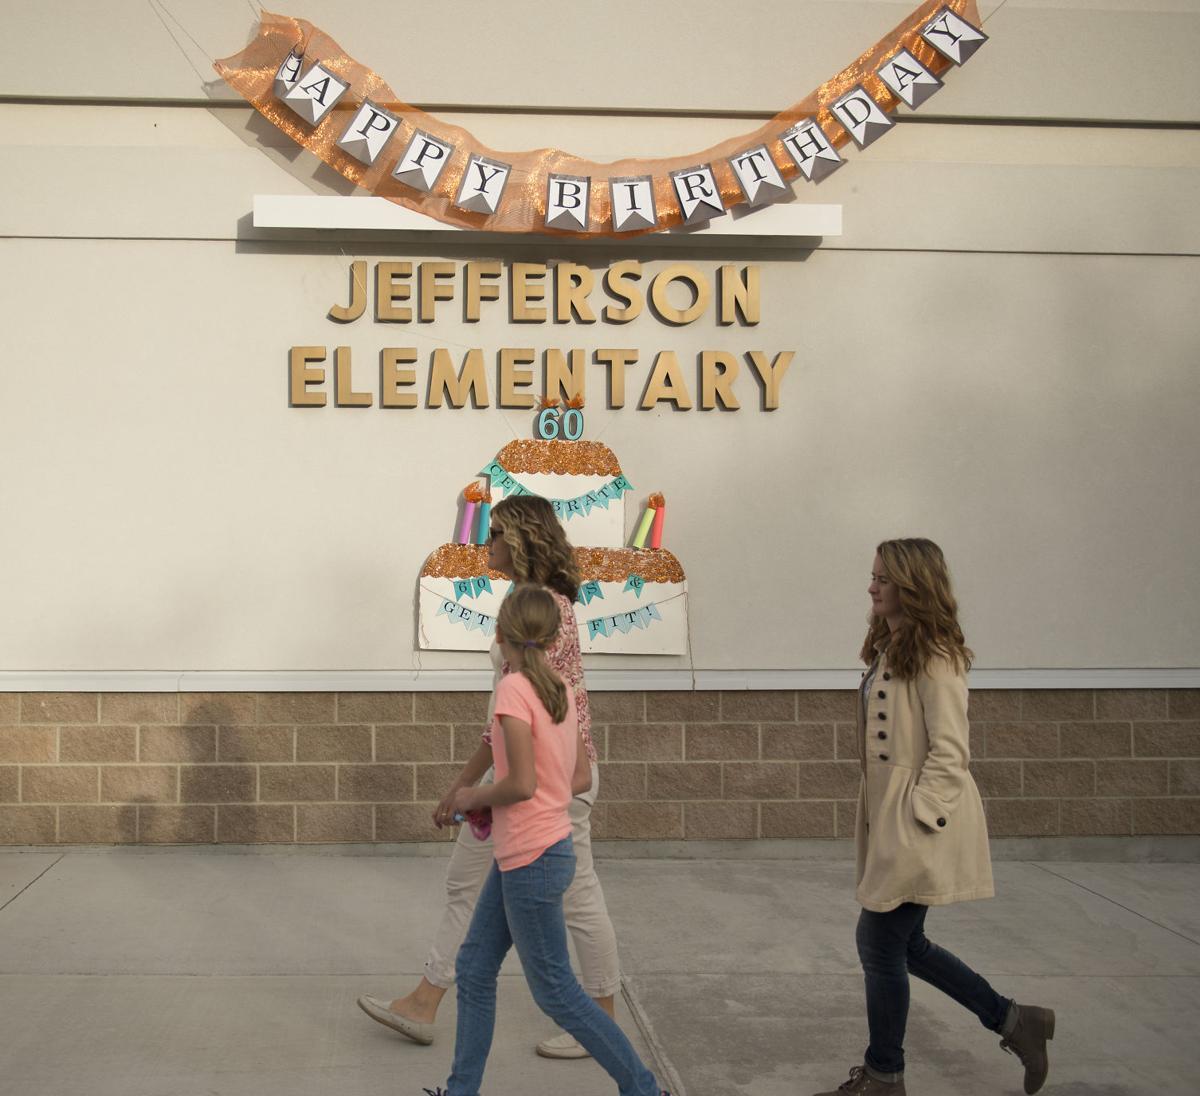 Jefferson Elementary turns 60